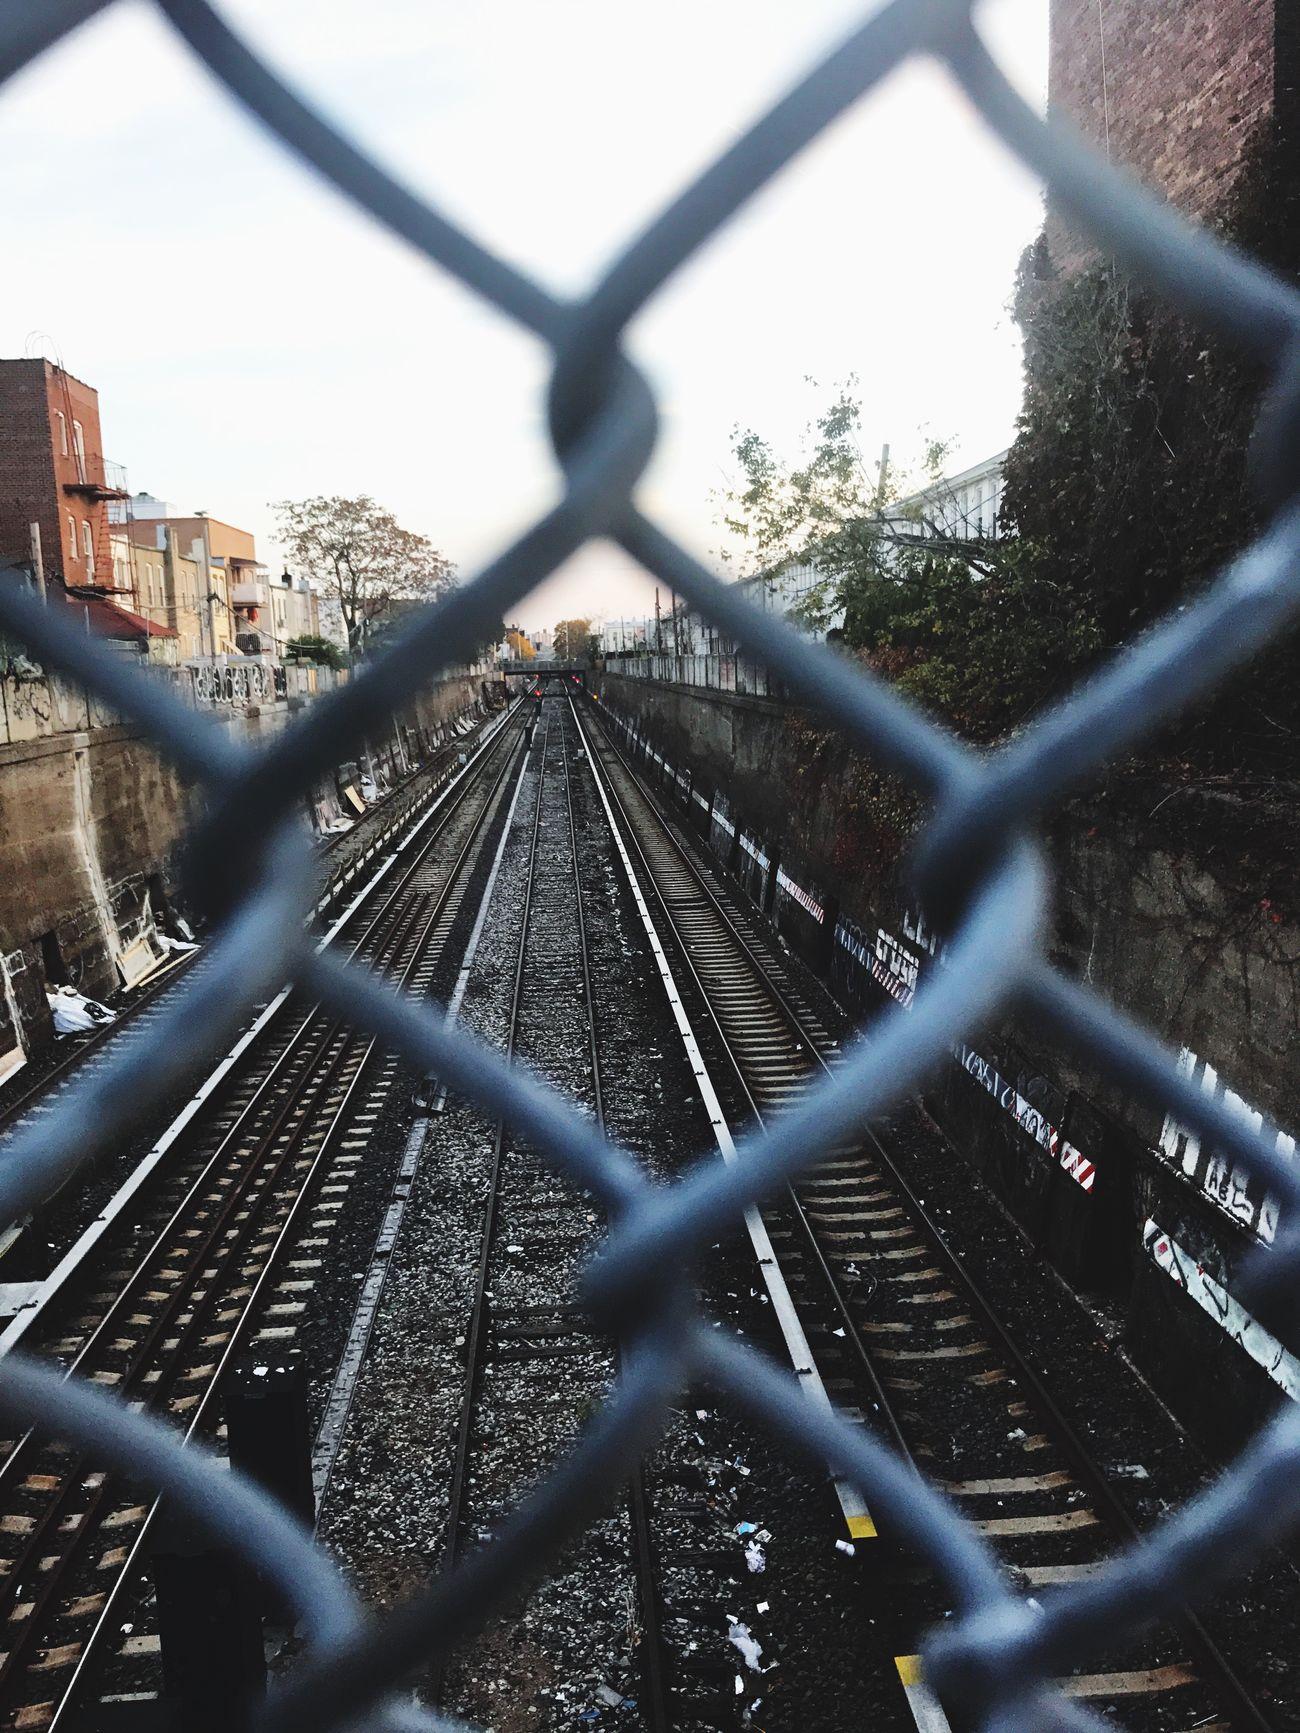 All Fenced in!! Brooklyn Railroad Track Tracks Chainlink Fence Choo Choo New York New York City NYC